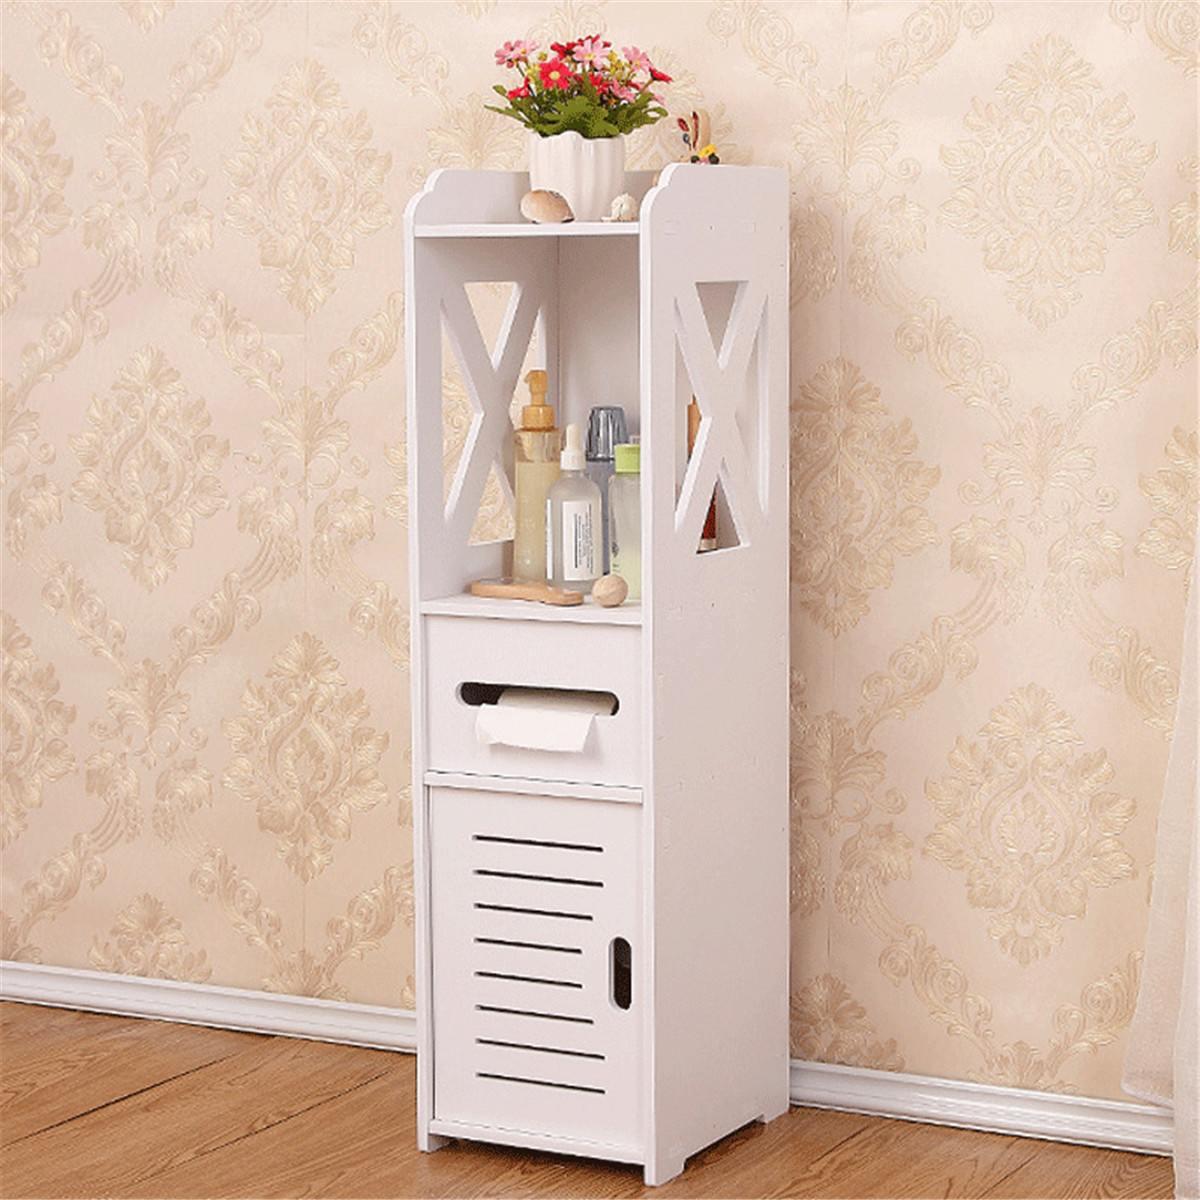 4 Layers Living Room Cabinet Rack Cupboard Storage Shelves Bathroom Corner Floor Cabinet Unit Toilet Tissue Drawers Furniture